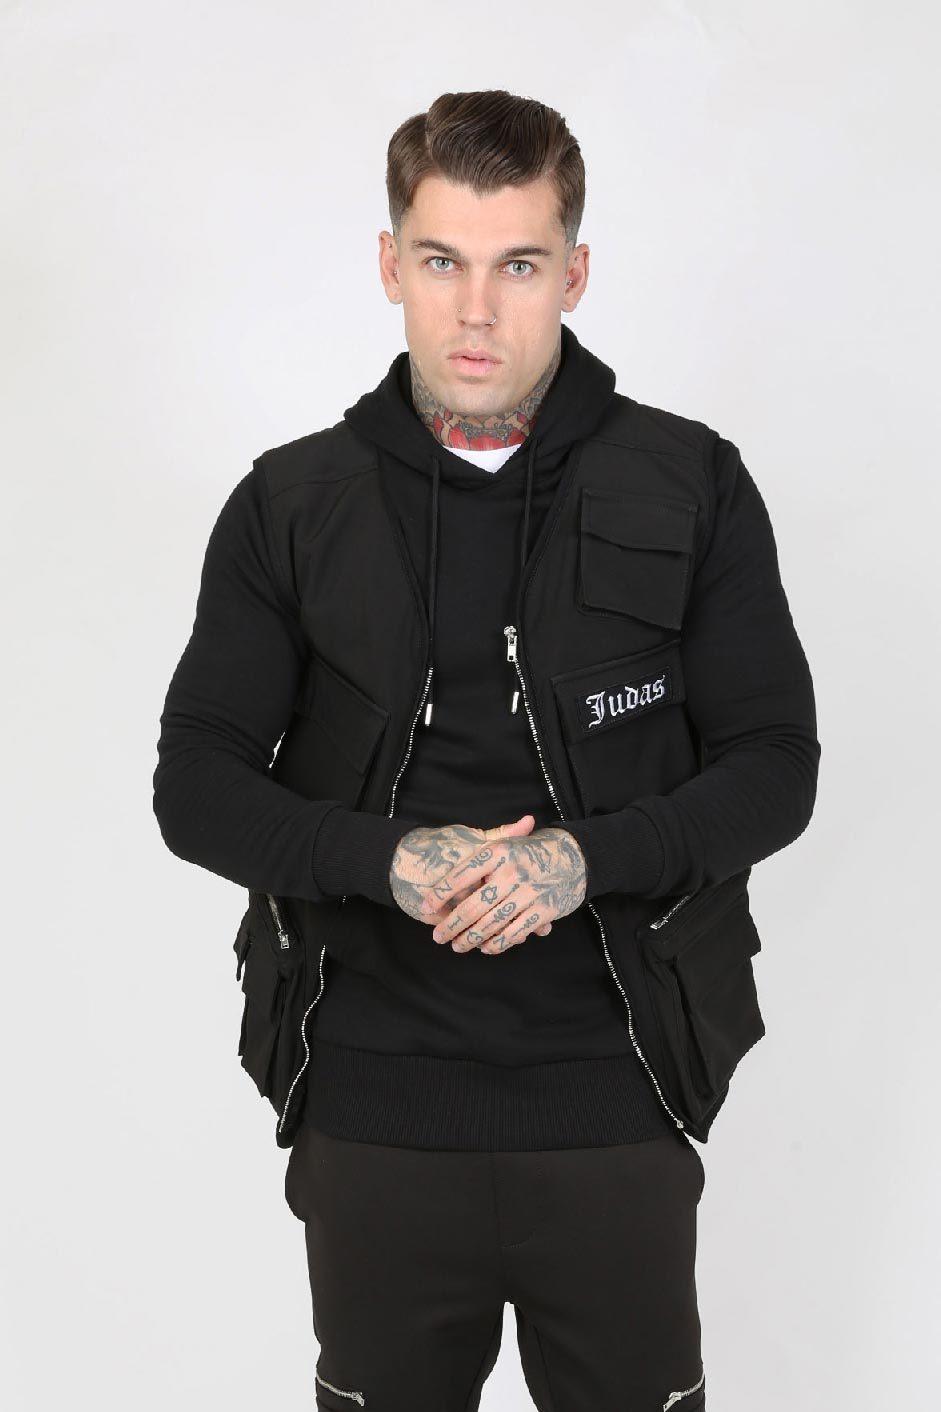 Couver Nylon Pocket Men's Utility Vest - Black, Medium